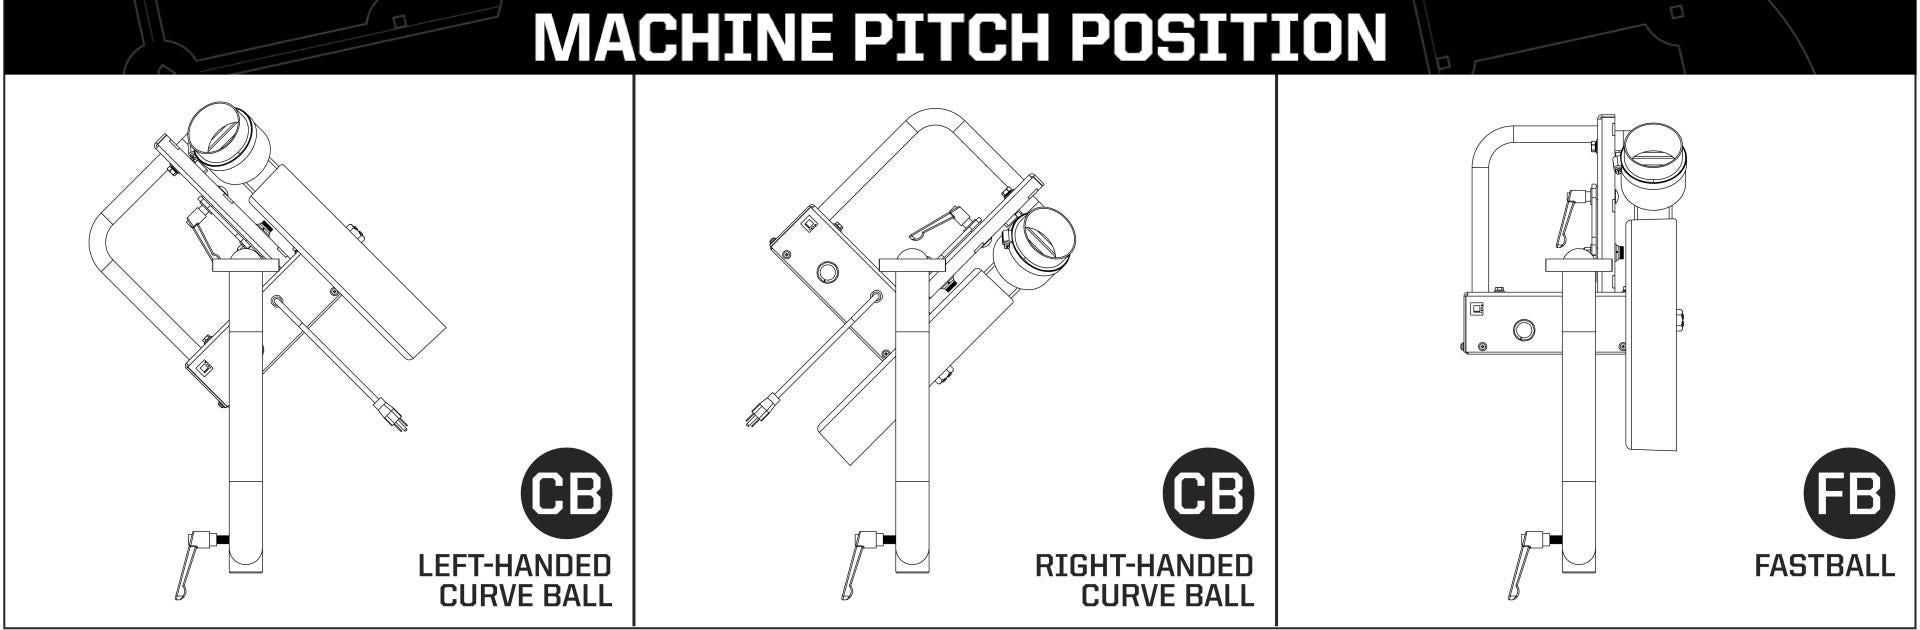 ATEC M1 Pitch Position